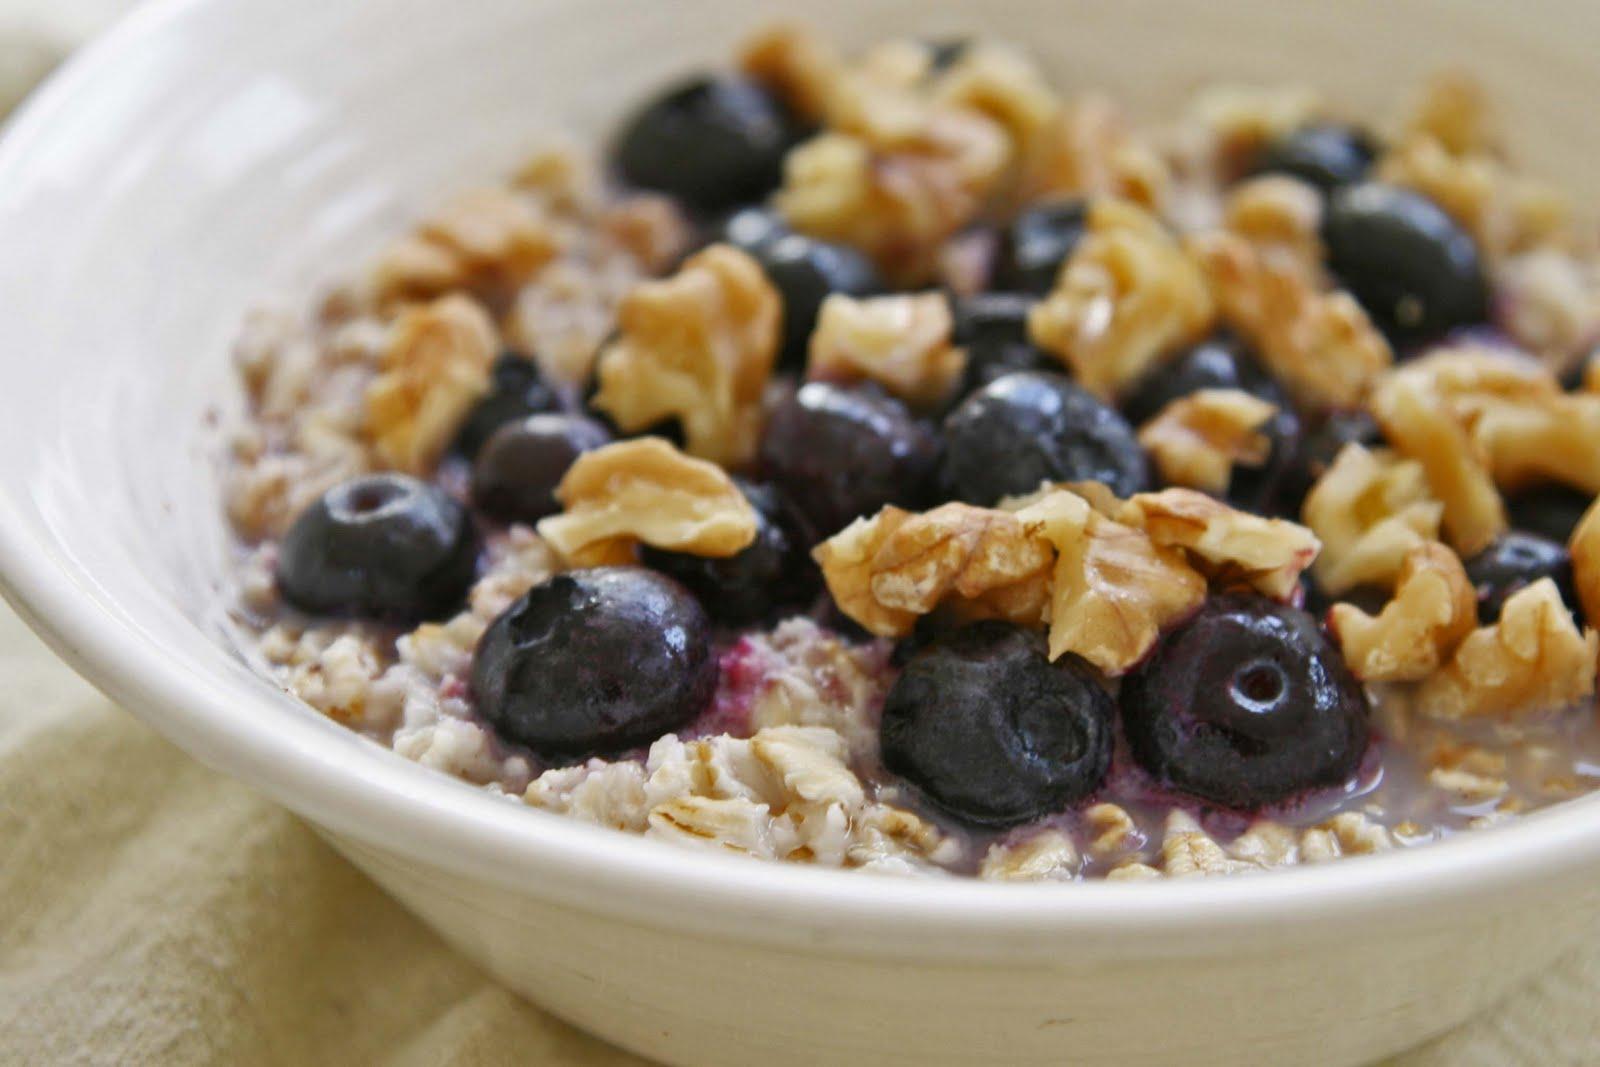 hanna's vegan kitchen: oats and oatmeal